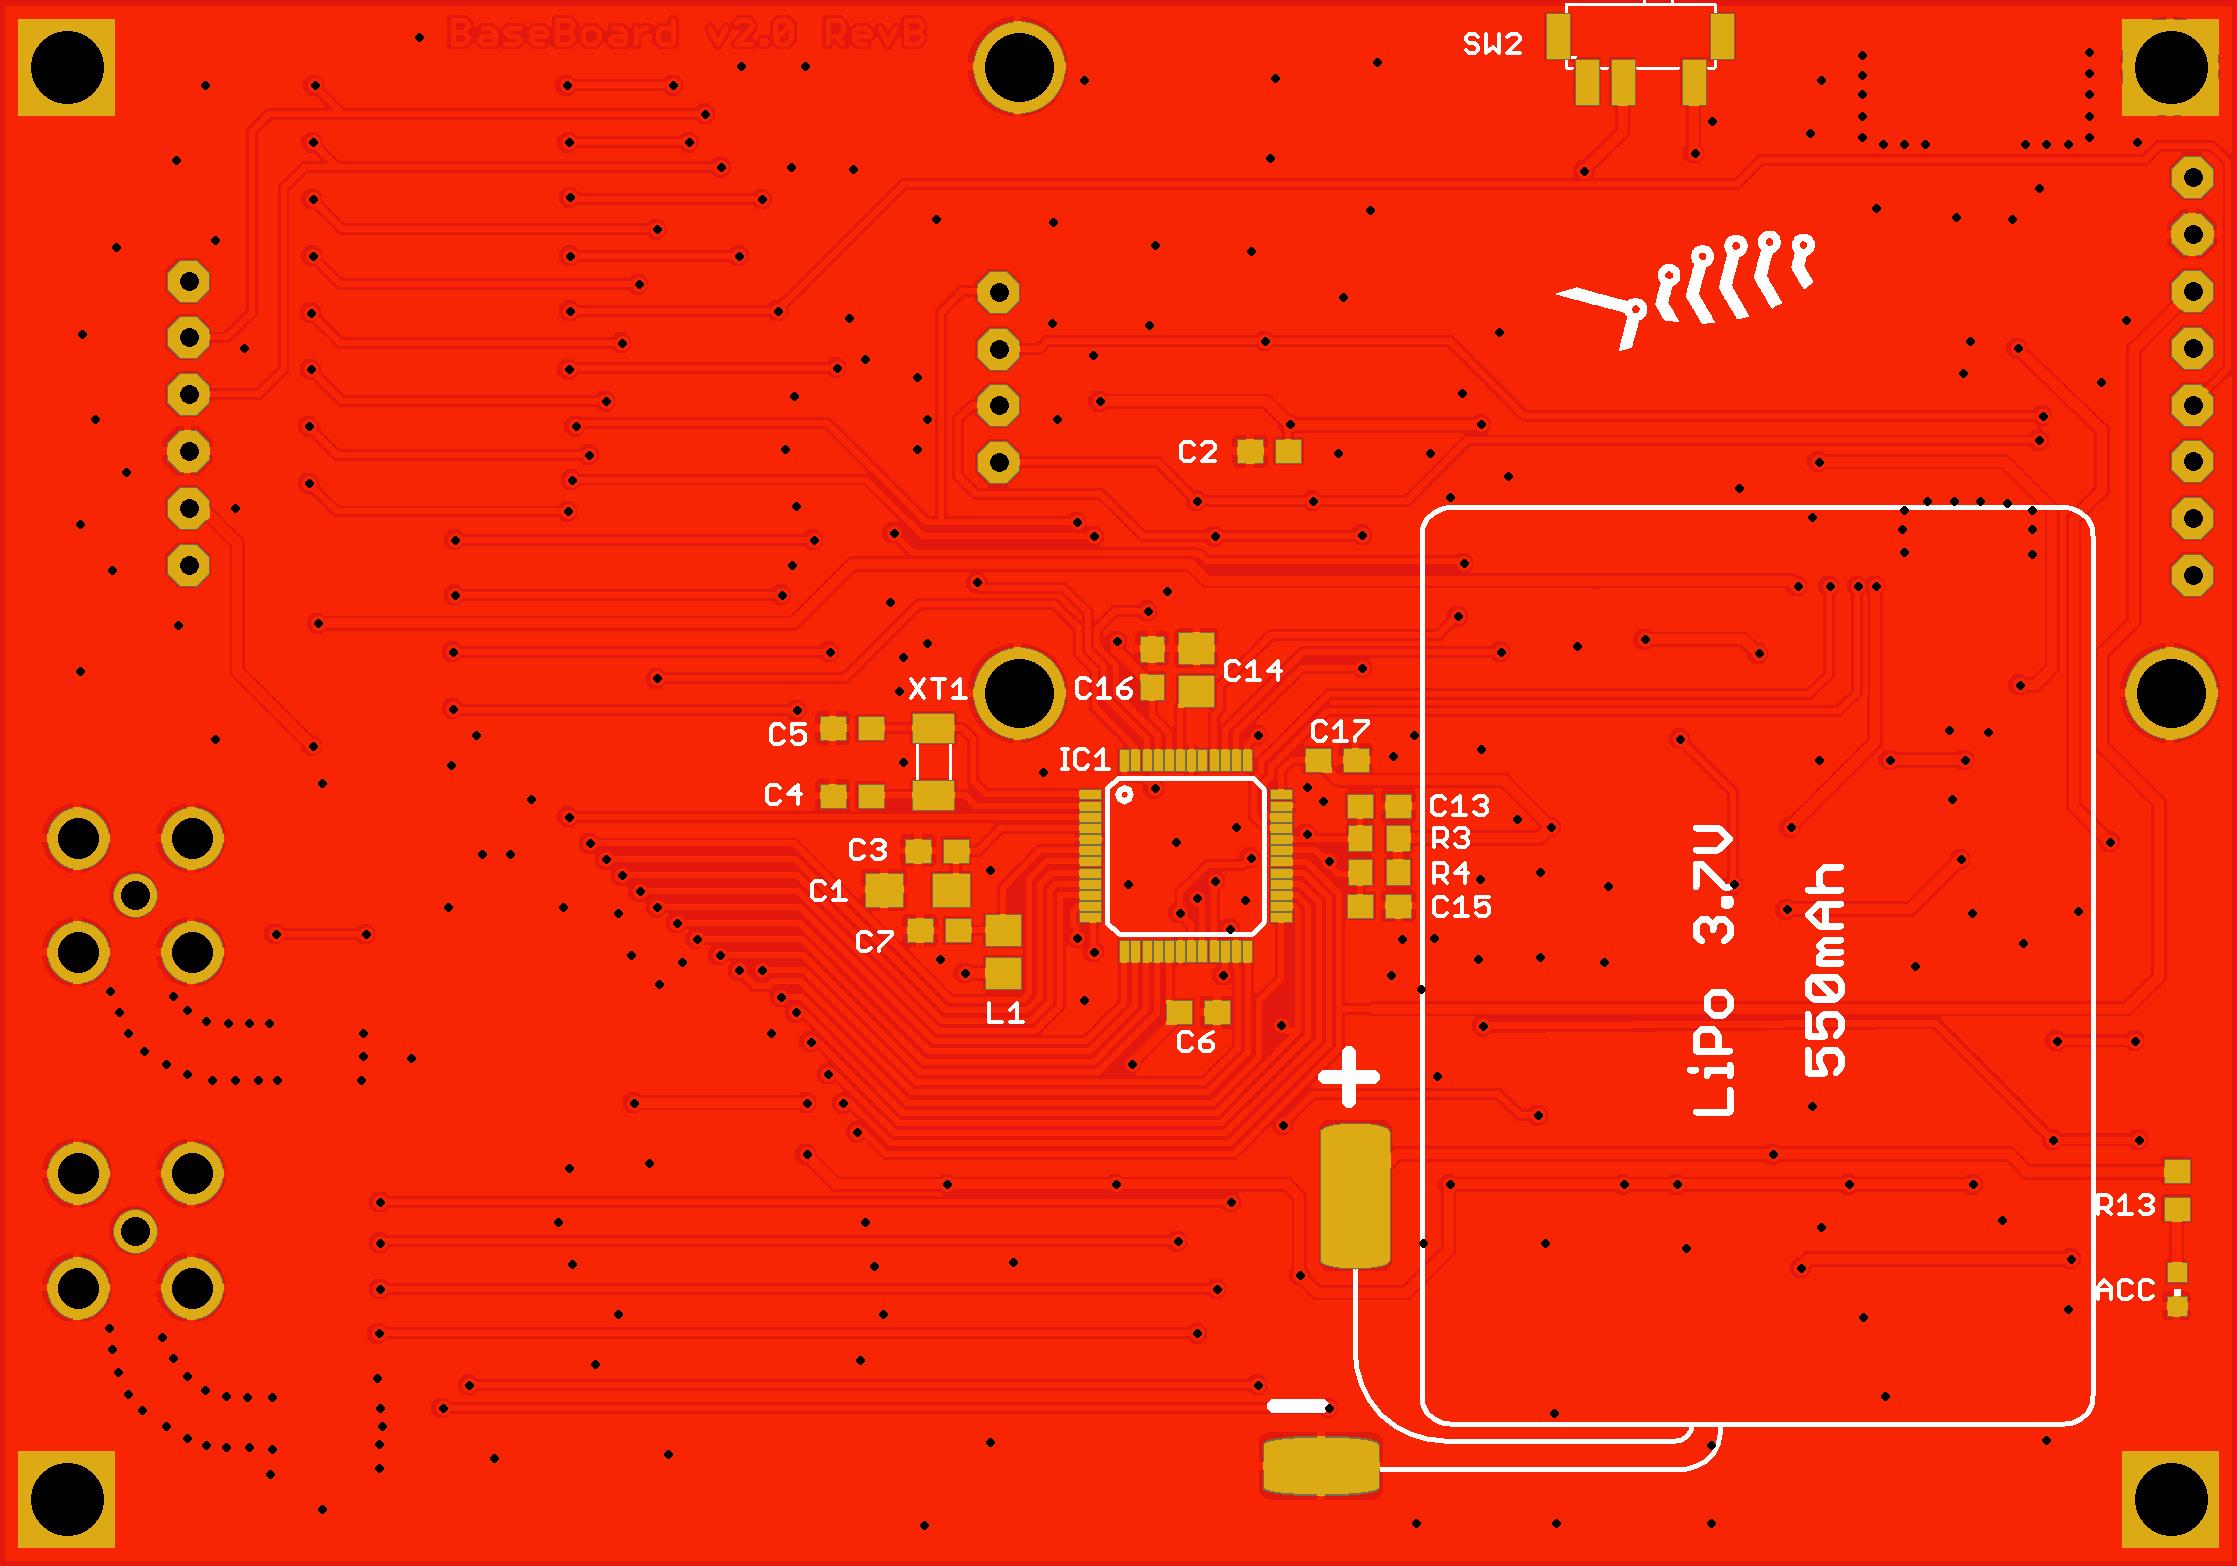 Hardware/Boards/BaseBoard_v2.0_RevB/PNGview/BaseBoard_v2.0_RevB_BOT.png